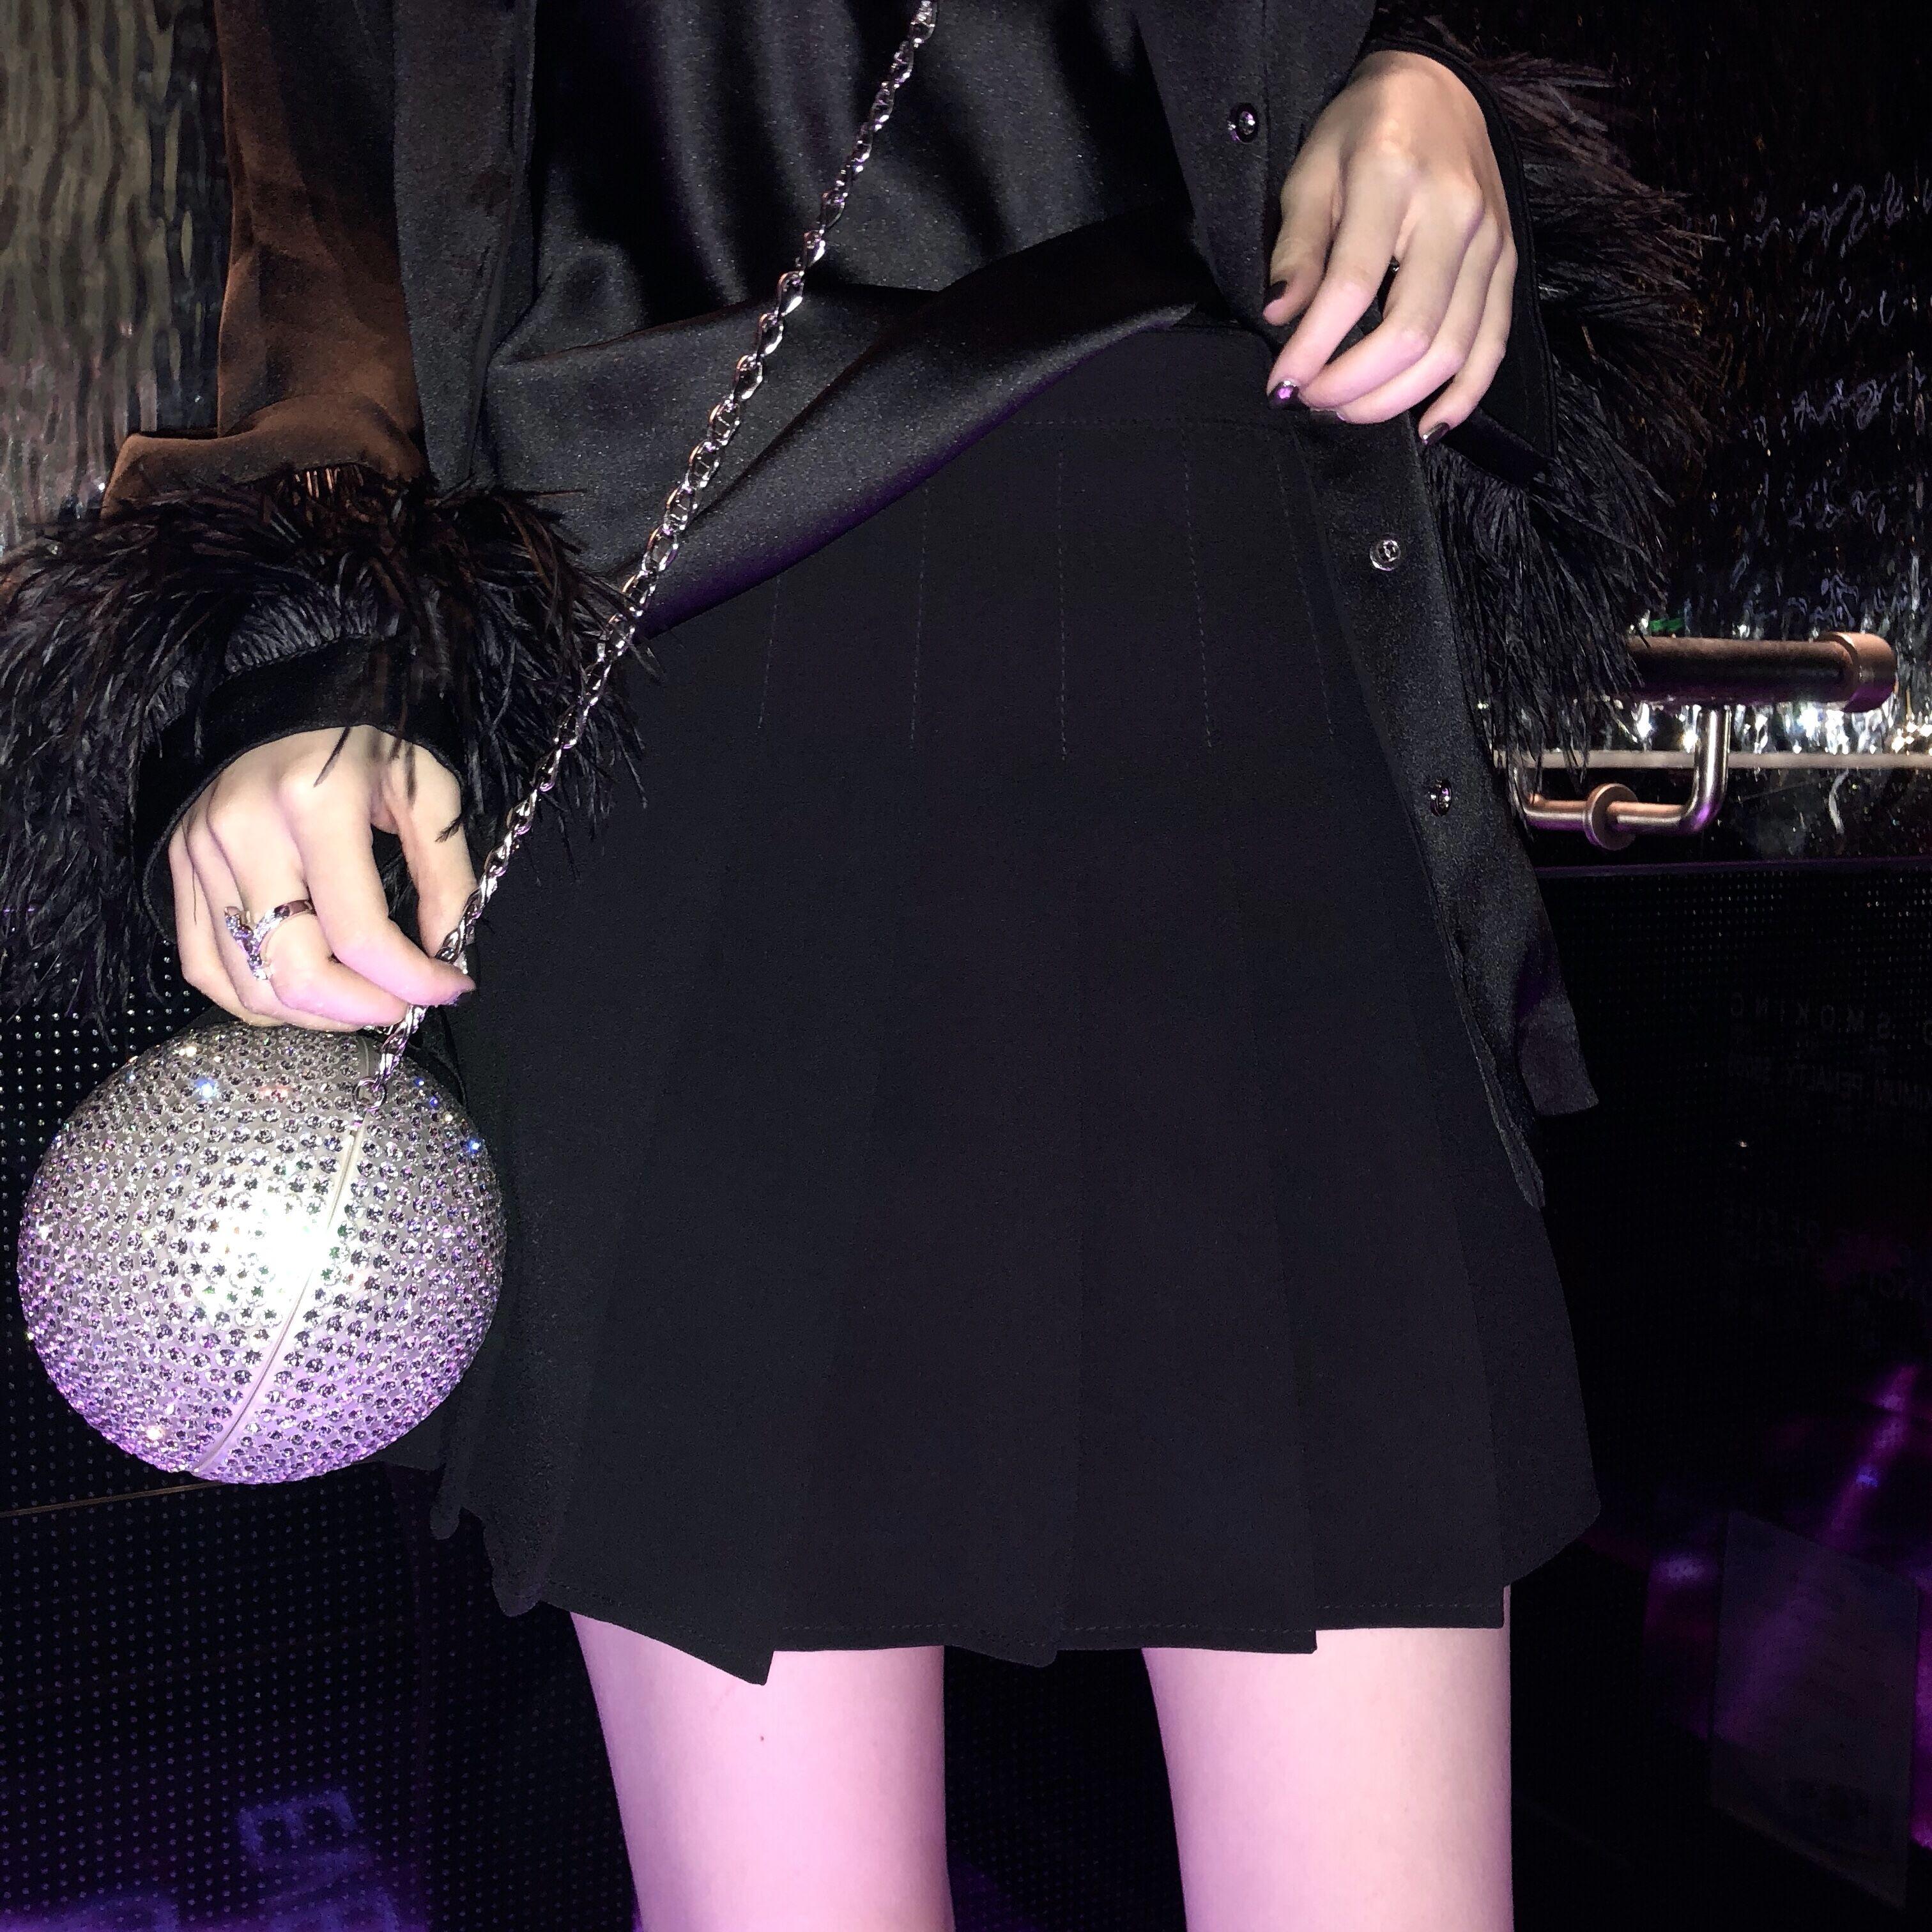 CHICYOU 人手一条黑白粉三色高腰显瘦百搭经典气质百褶短裙裙裤热销41件手慢无